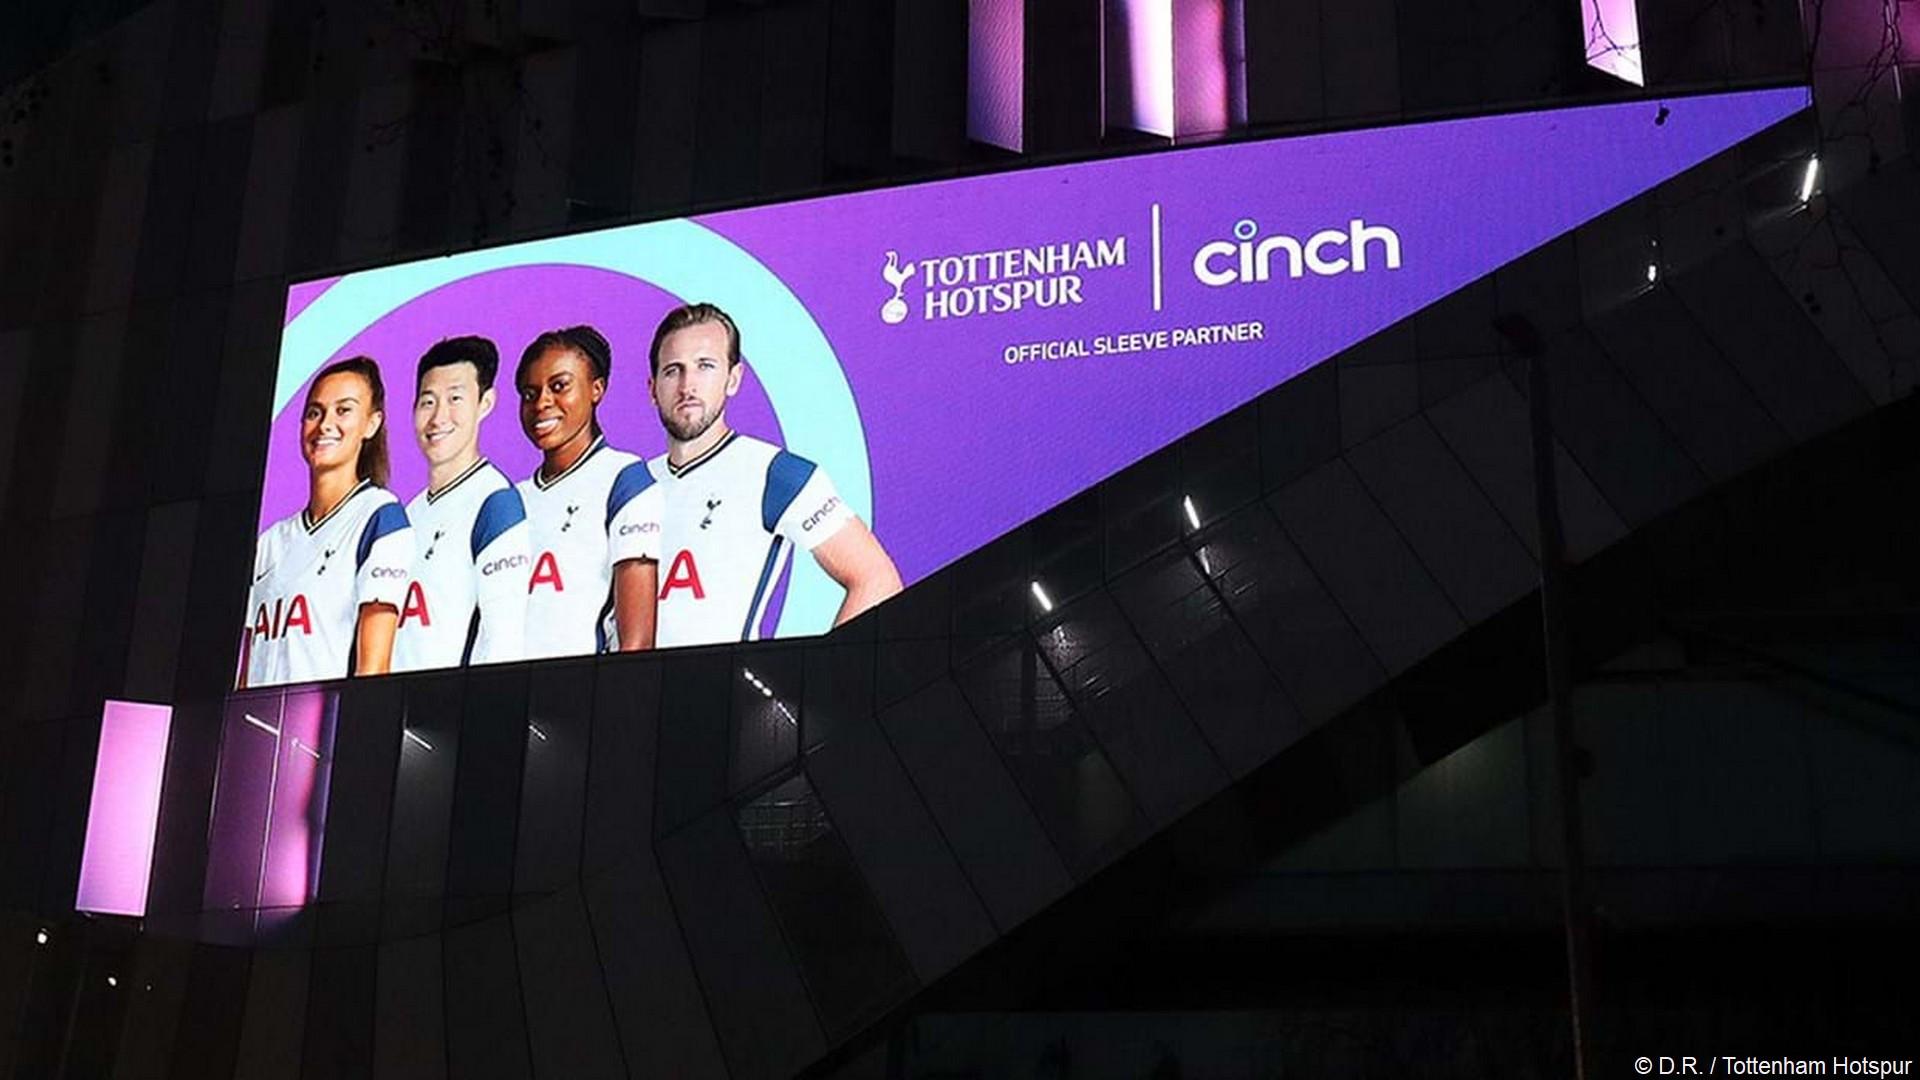 Cinch x Tottenham (football) 2021